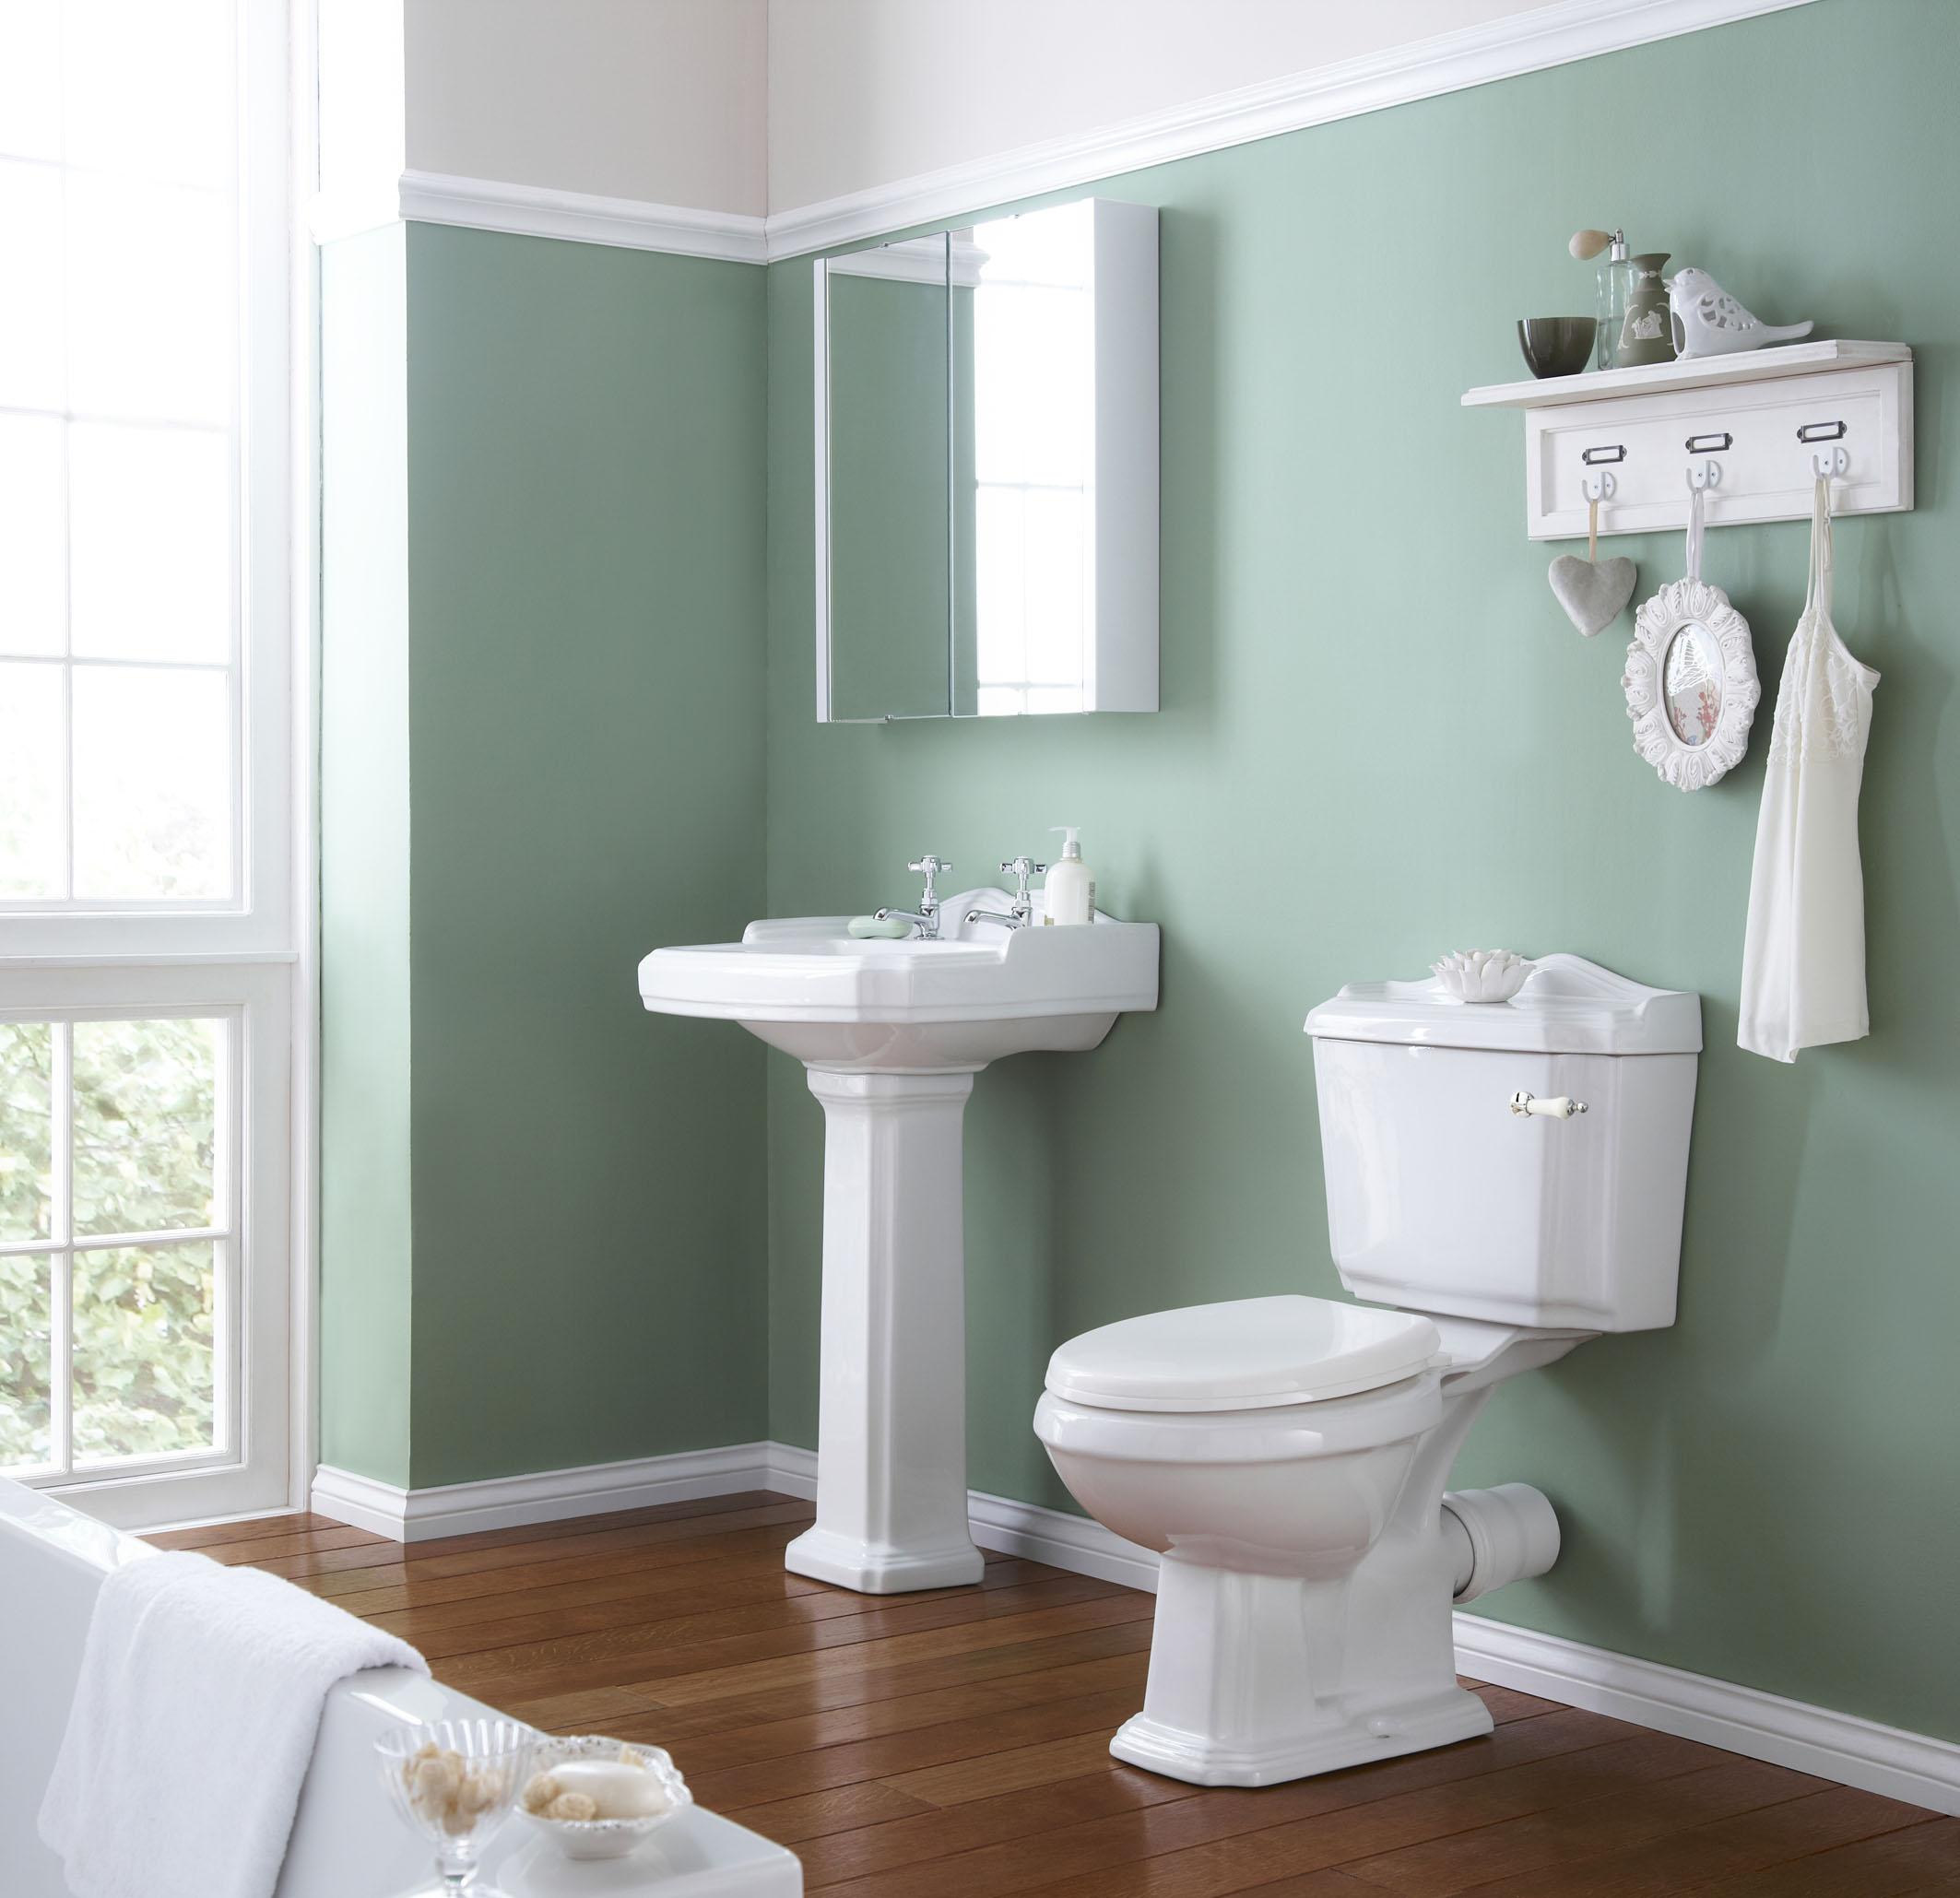 Покраска ванной комнаты своими руками фото 30